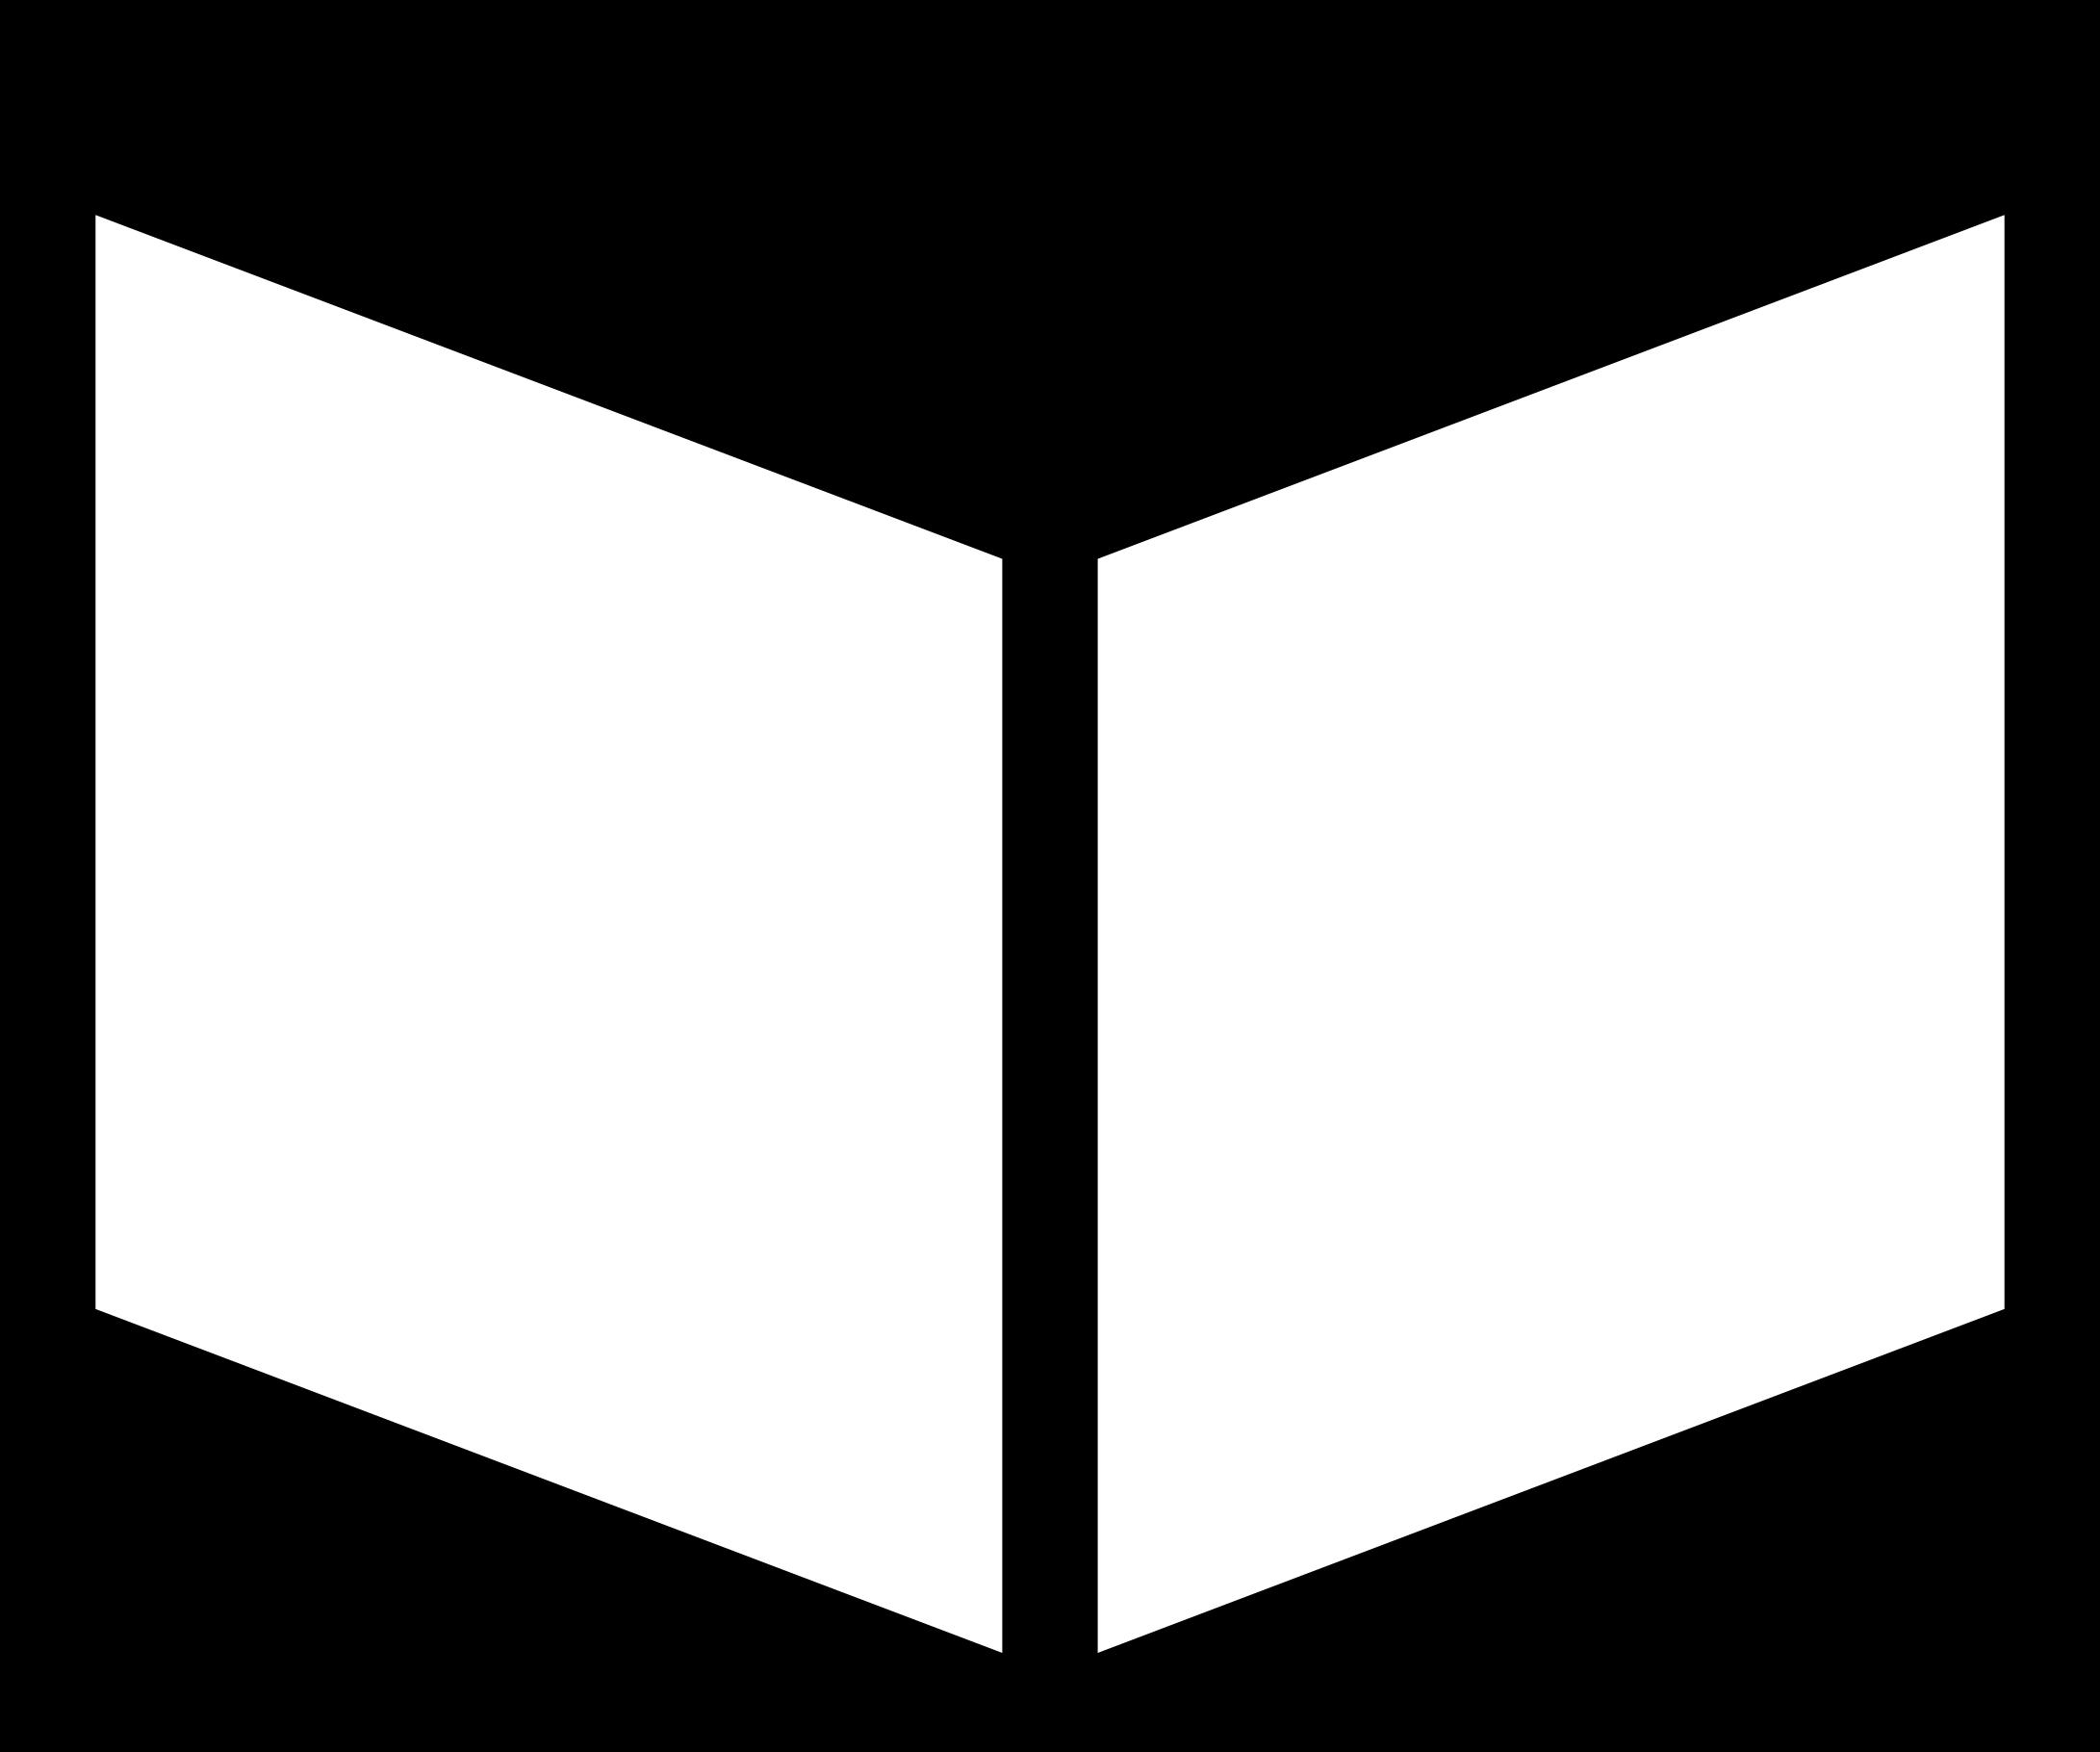 Square clipart book. Pictograph remix big image